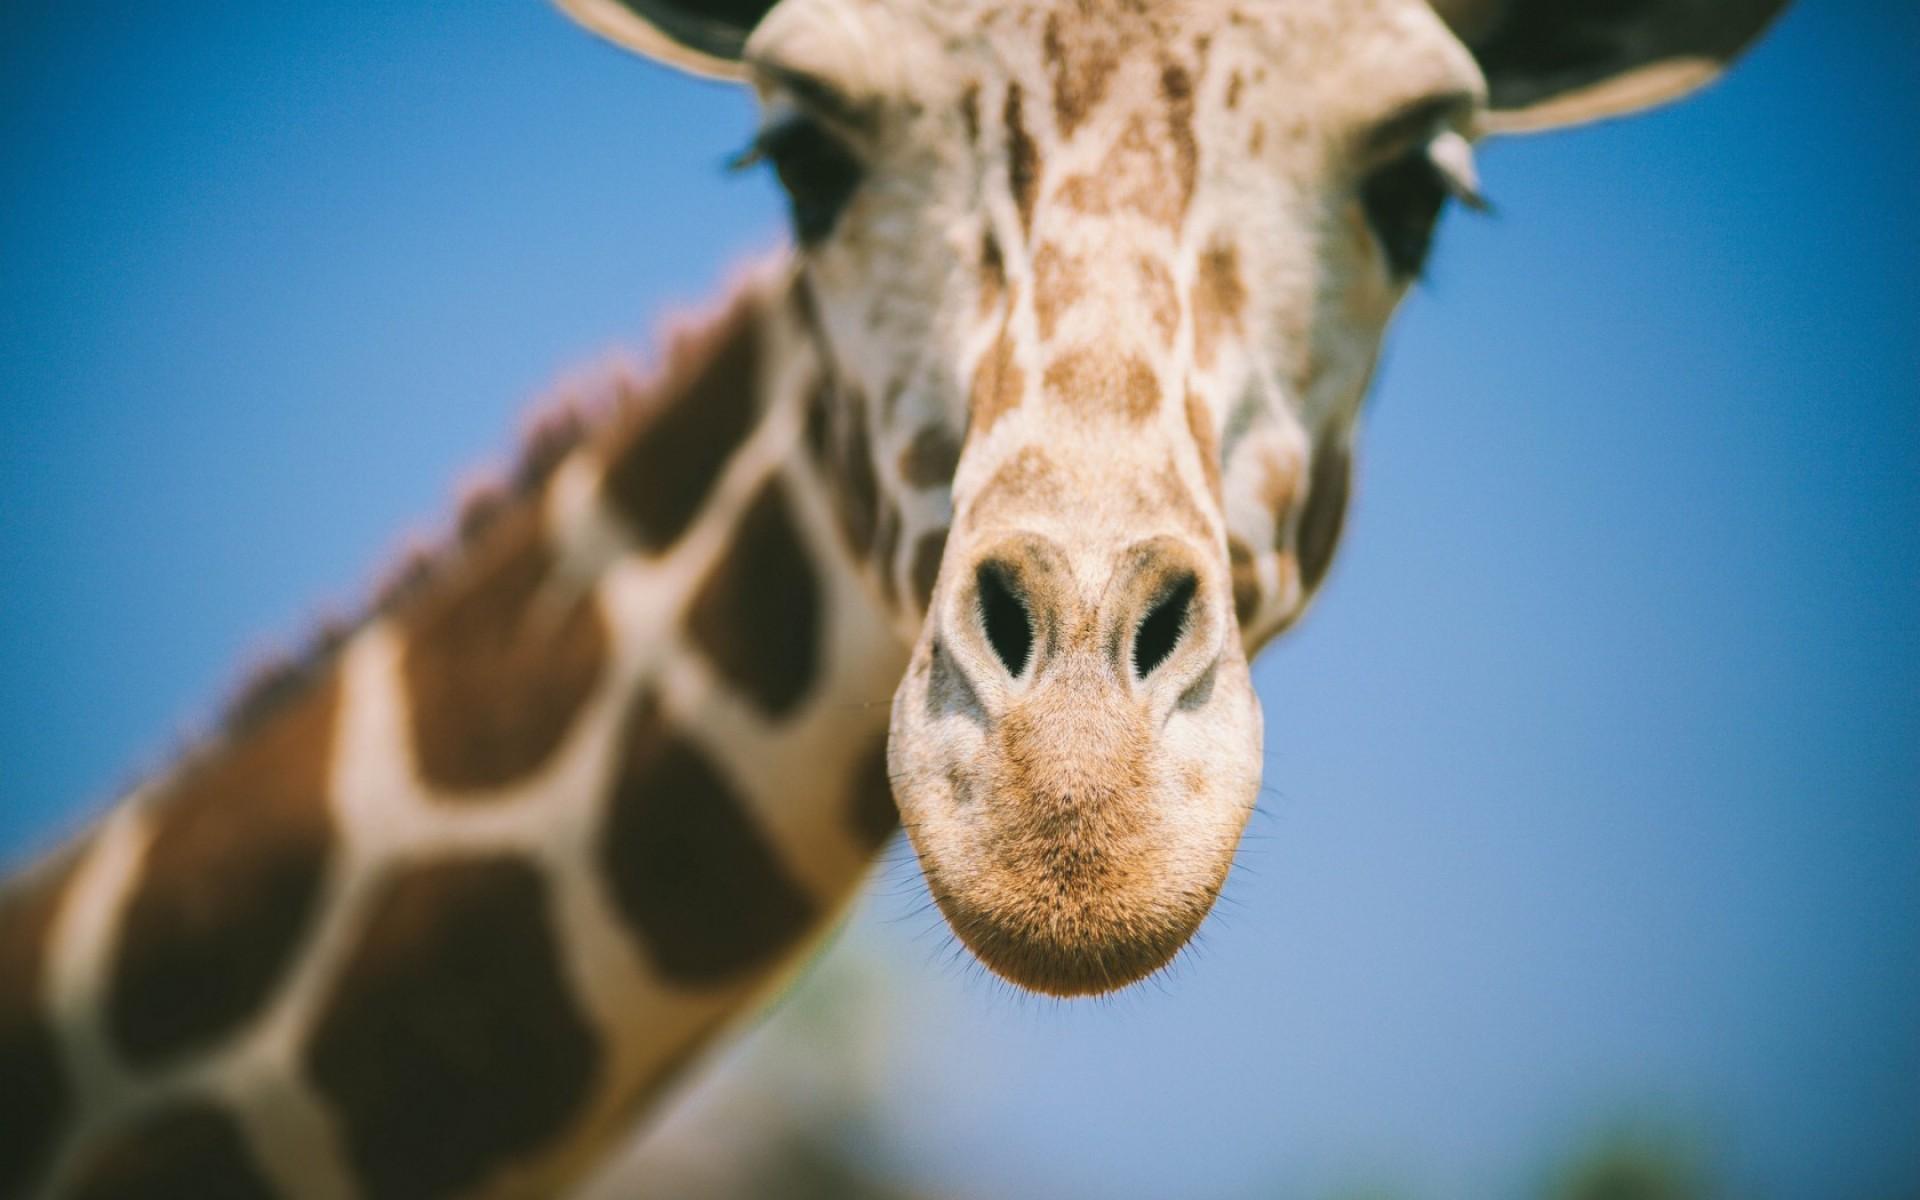 Giraffe face close-up: